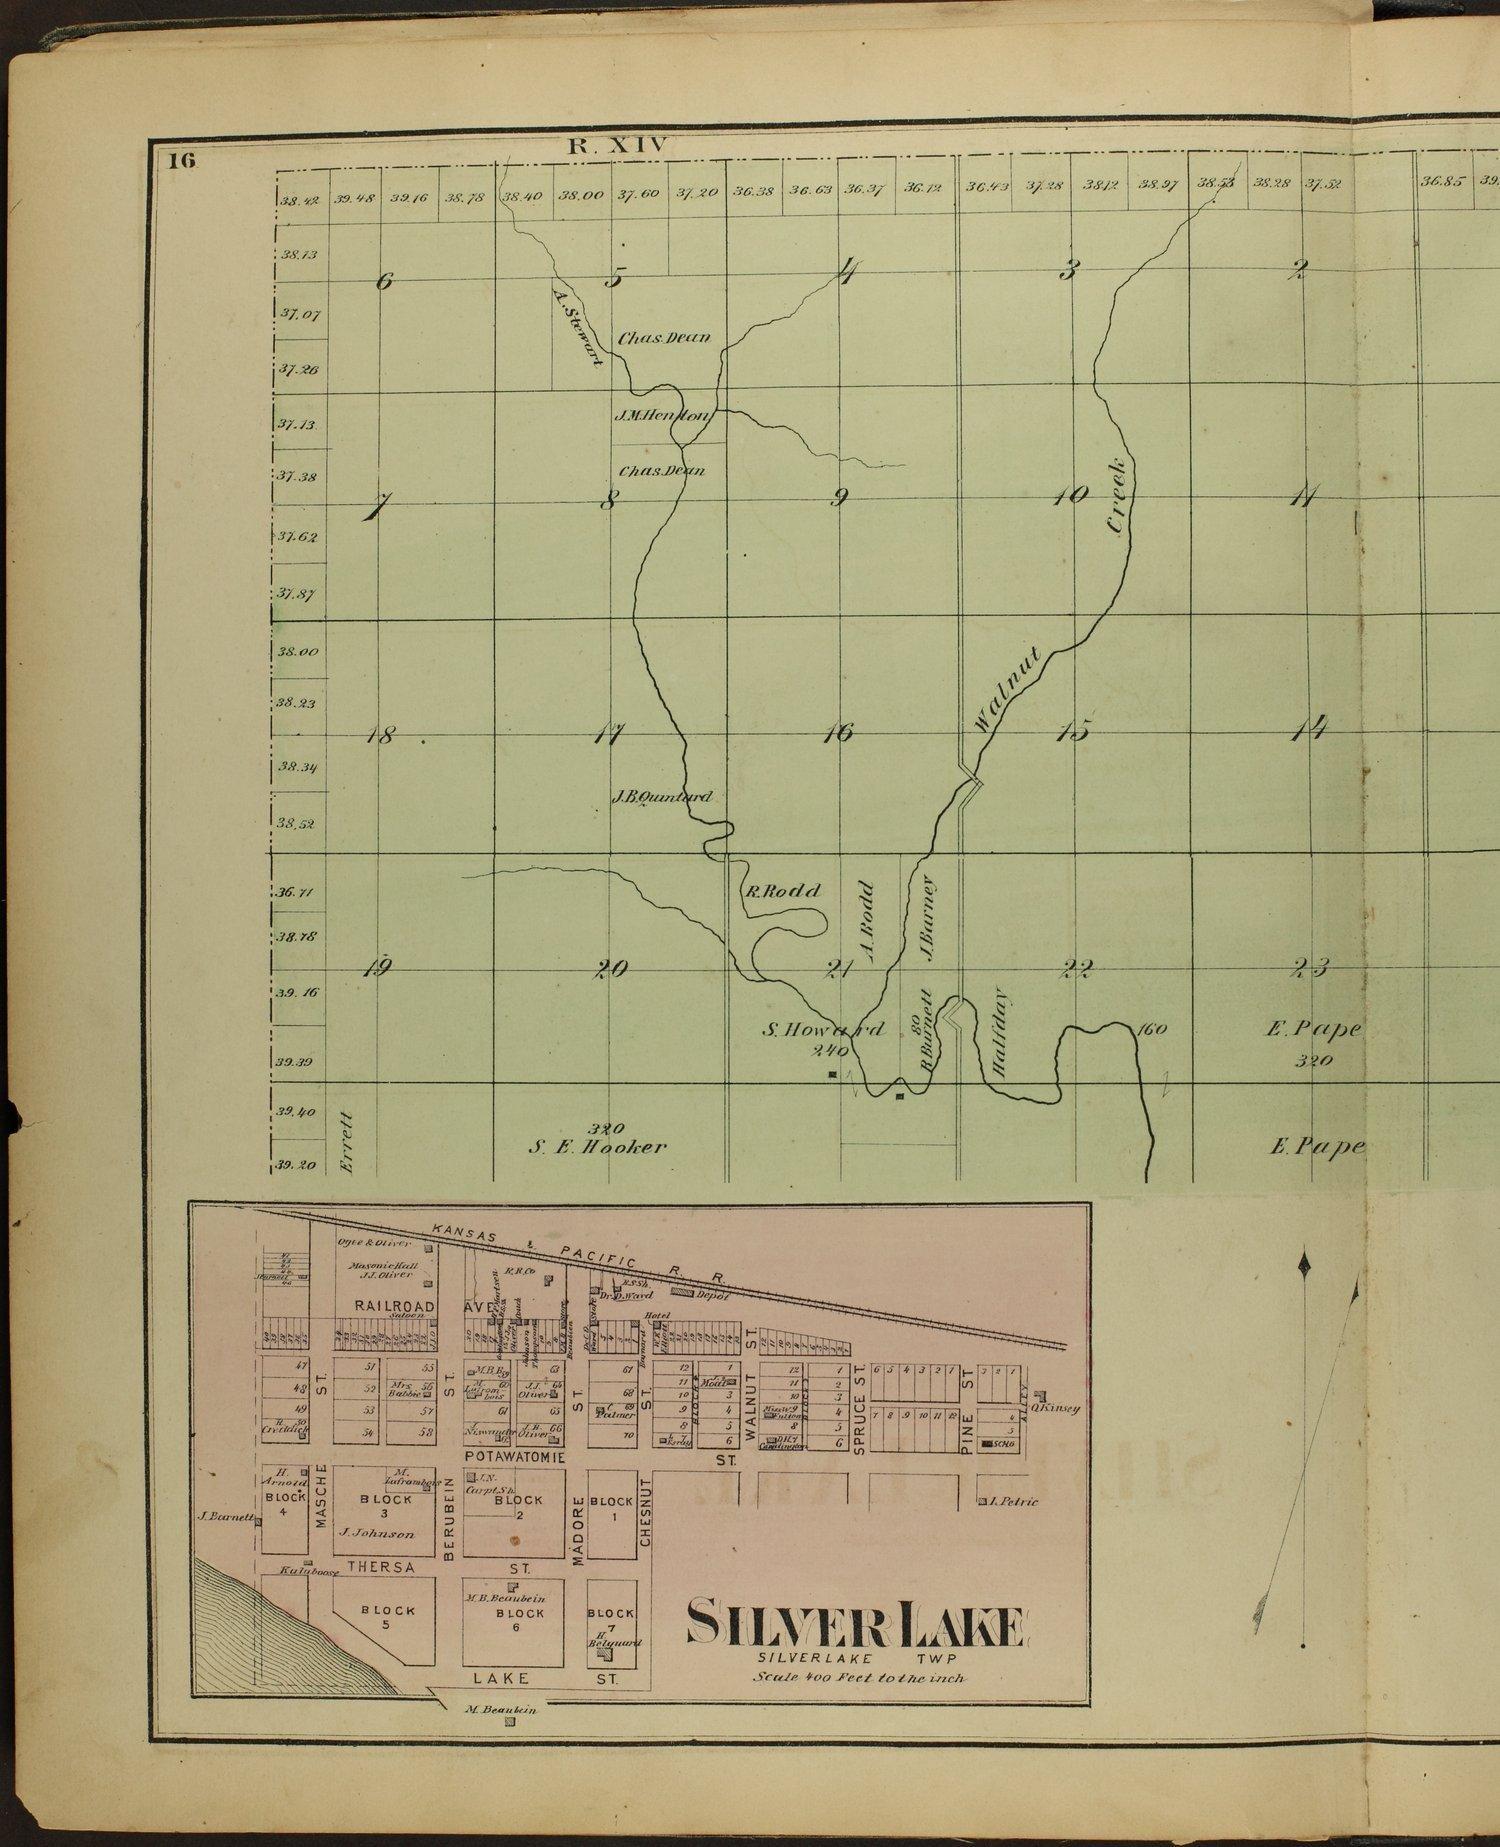 Atlas of Shawnee County, Kansas - 16